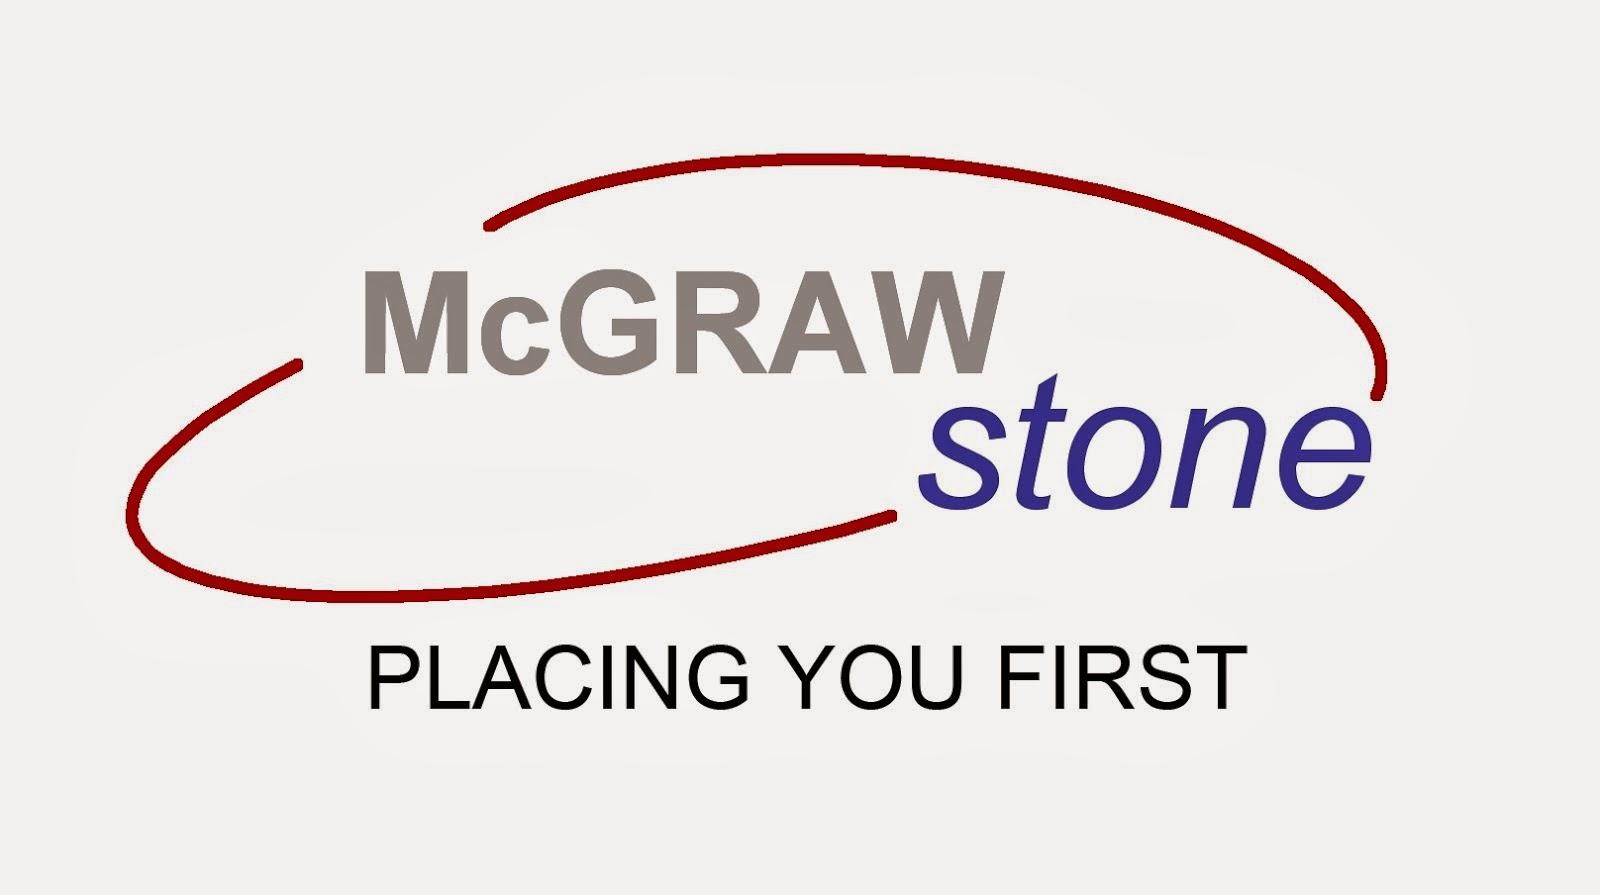 McGraw Stone Consulting